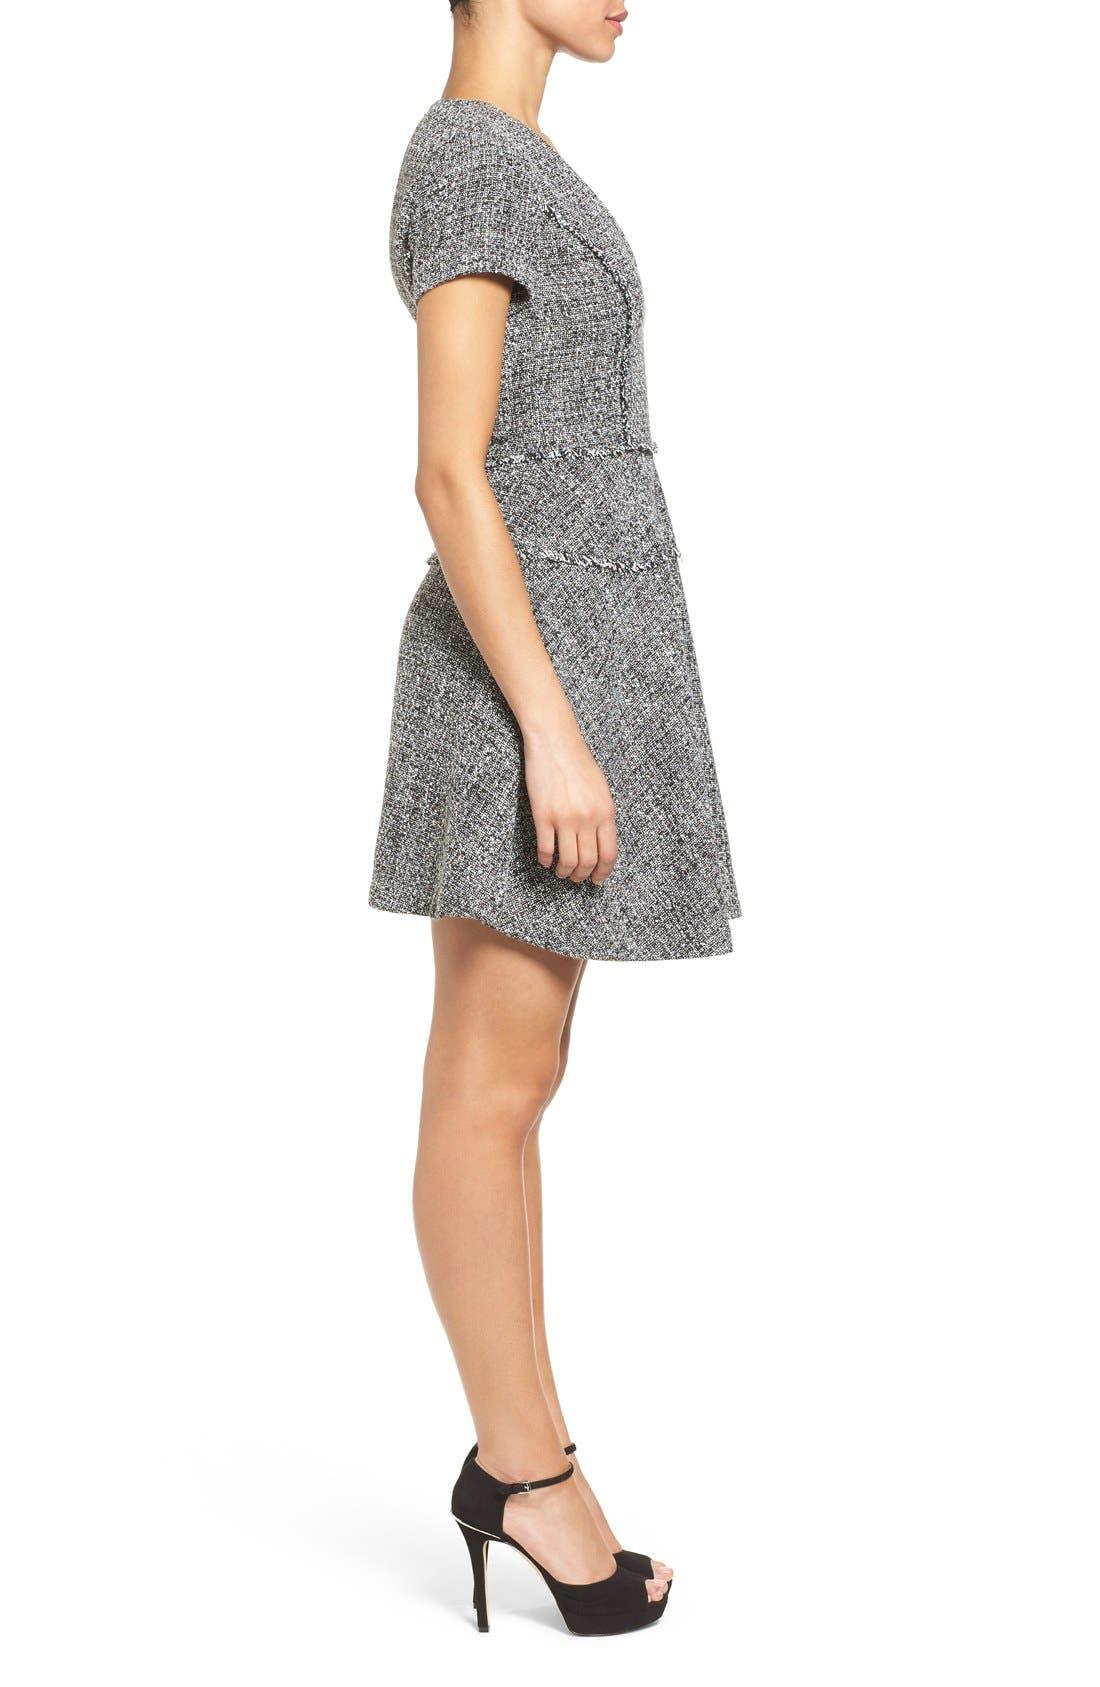 MICHAEL MICHAEL KORS,                             Tweed Fit & Flare Dress,                             Alternate thumbnail 2, color,                             001